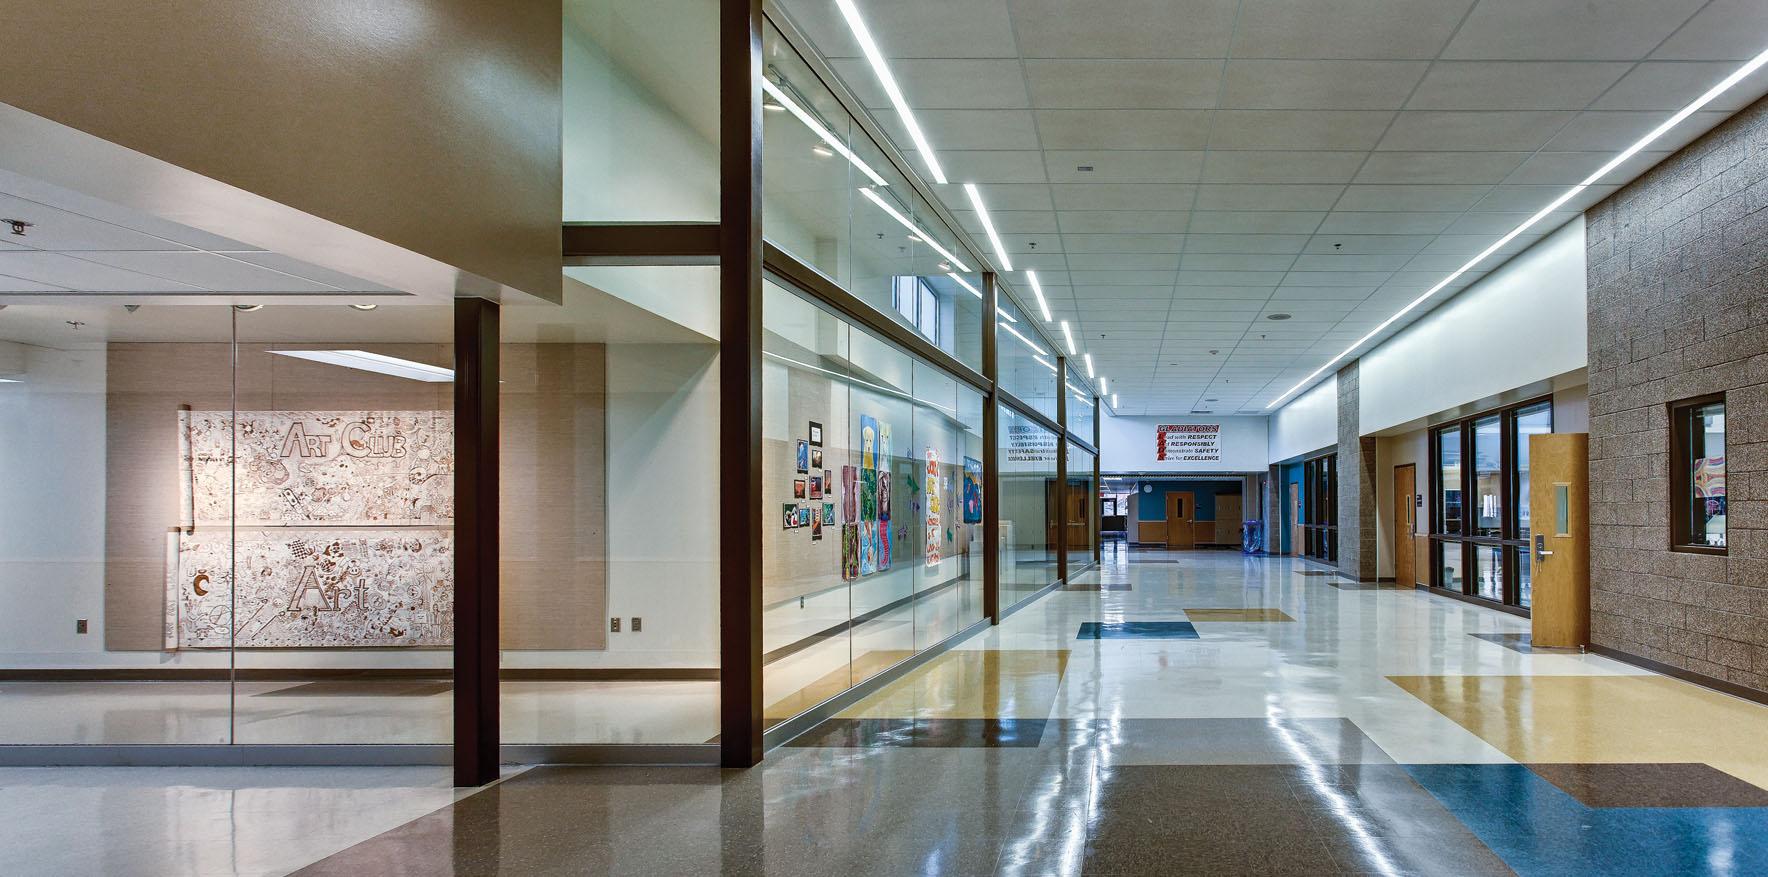 Interior, Gallery & Hallway [Photo by Gary Wilson]